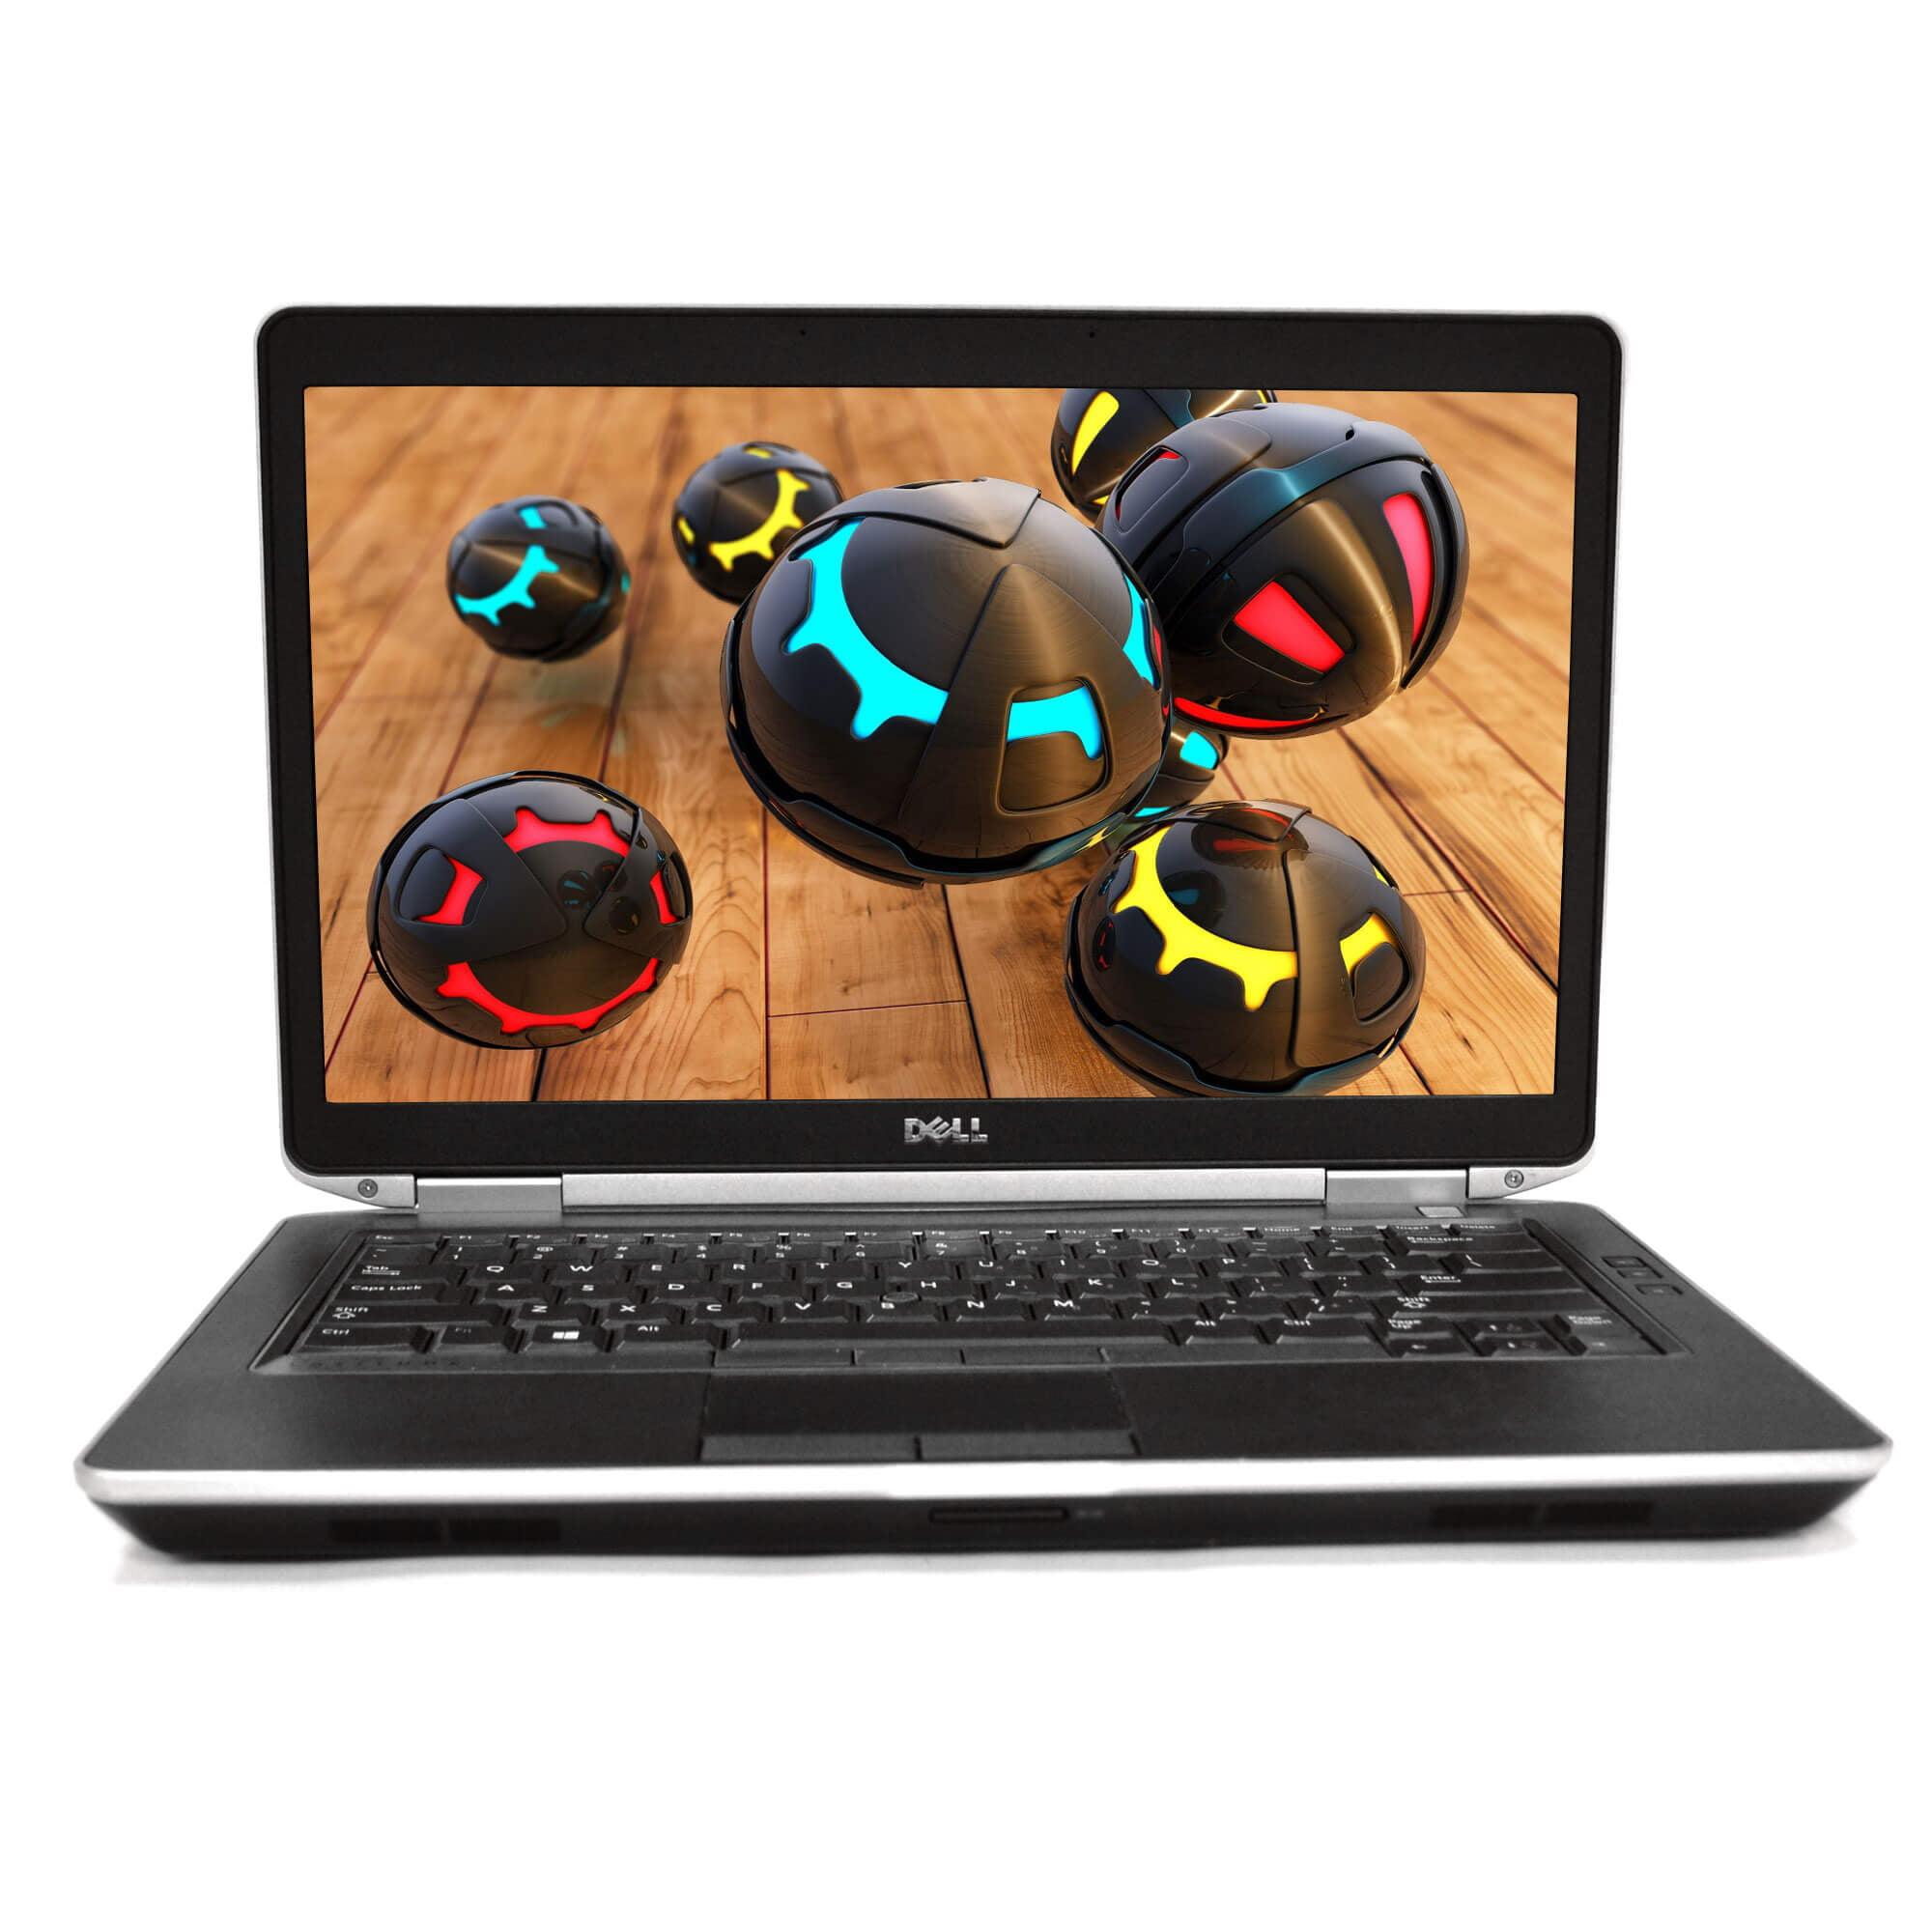 Refurbished Dell Black Latitude E6430 14'' PC Laptop Intel i5 Dual Core 2.5GHz 8GB RAM 1TB HDD Intel HD Graphics 4000 1368 x 768 Display Windows 10 Professional 64-Bit